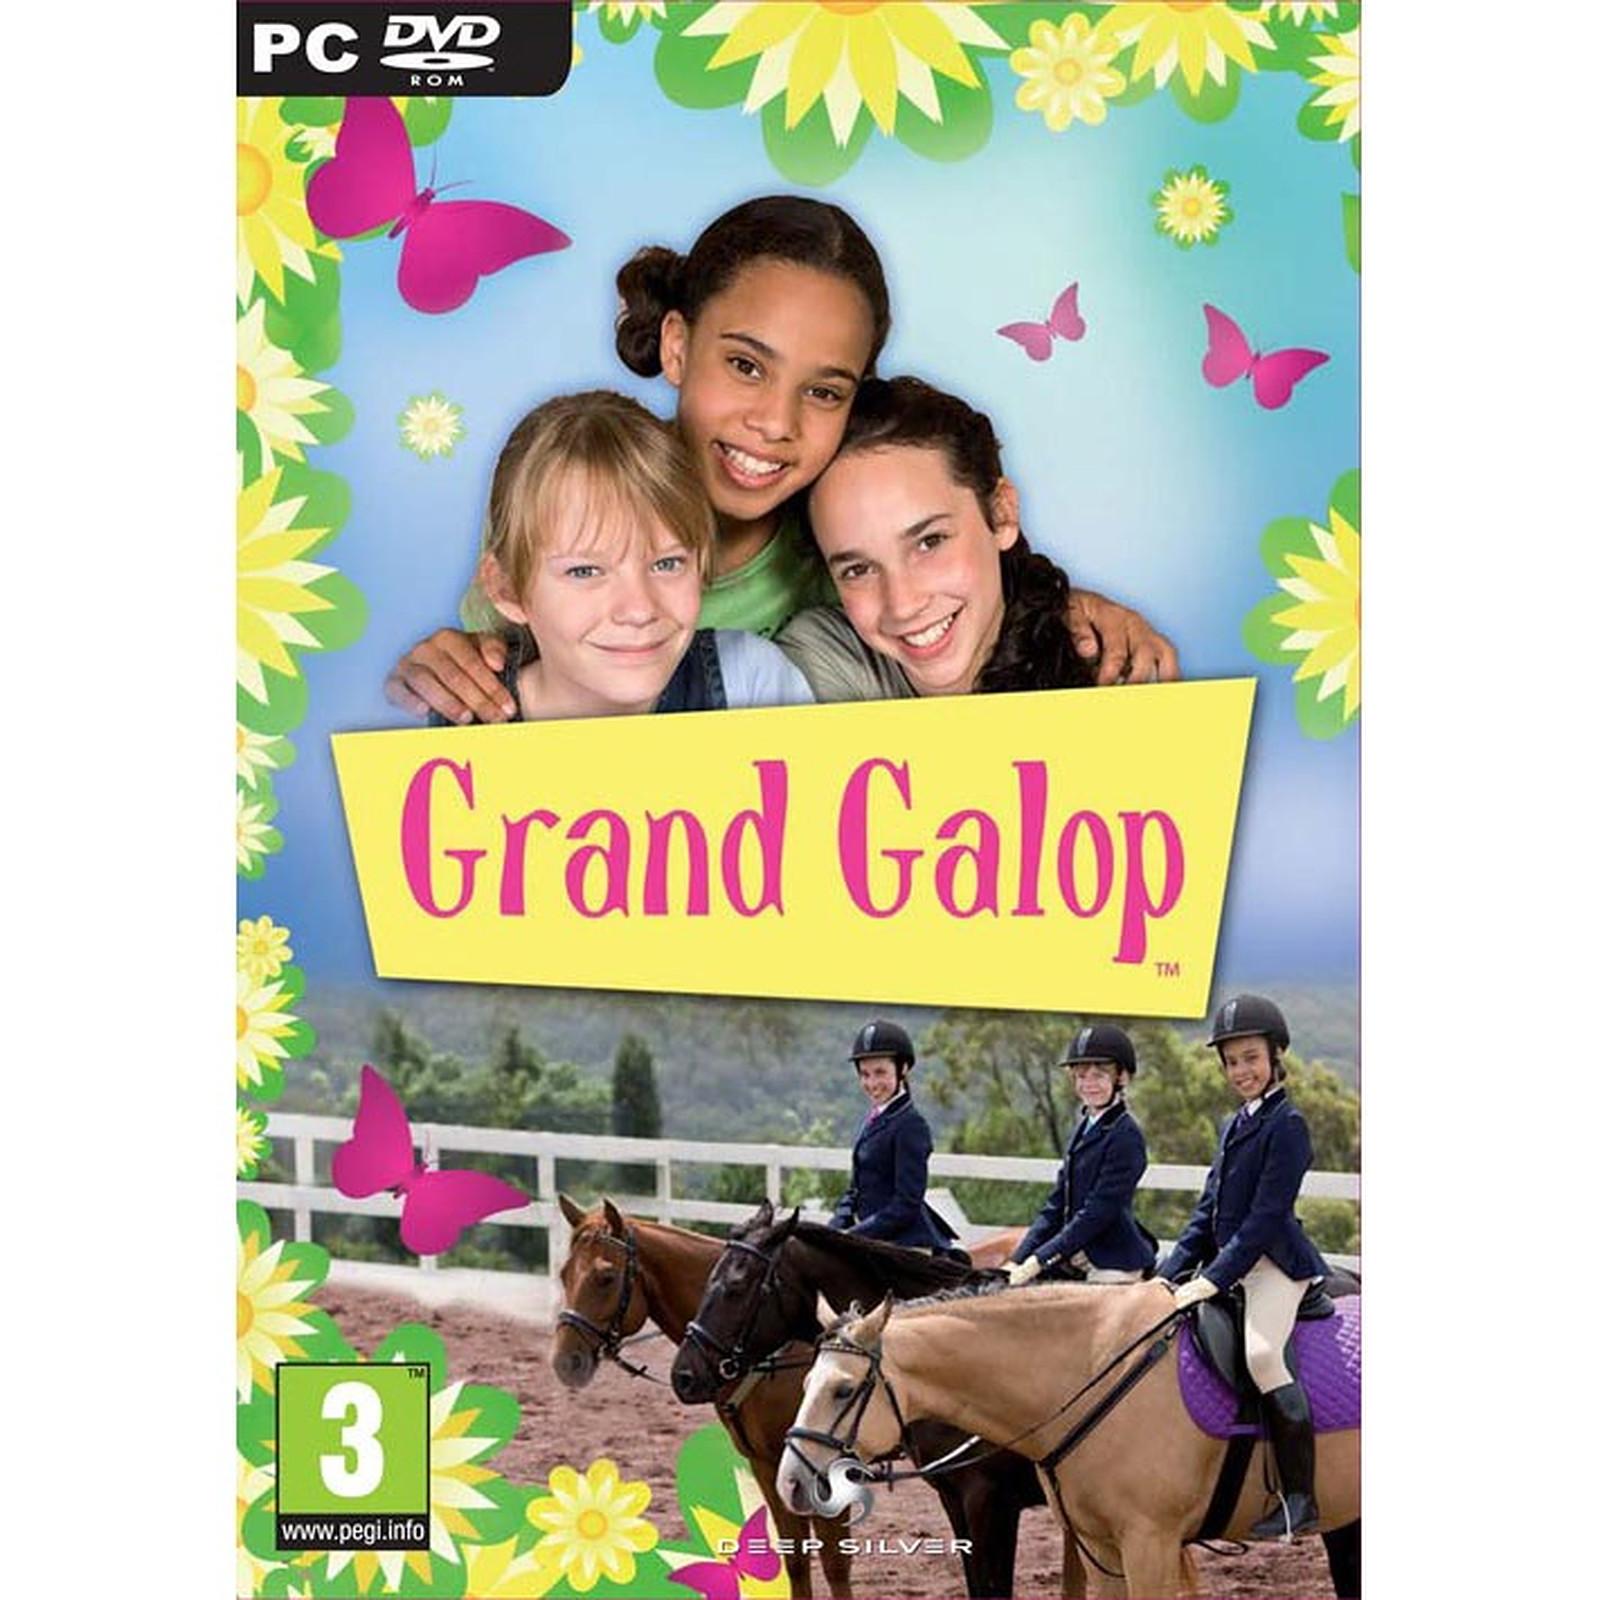 Grand Galop (PC)